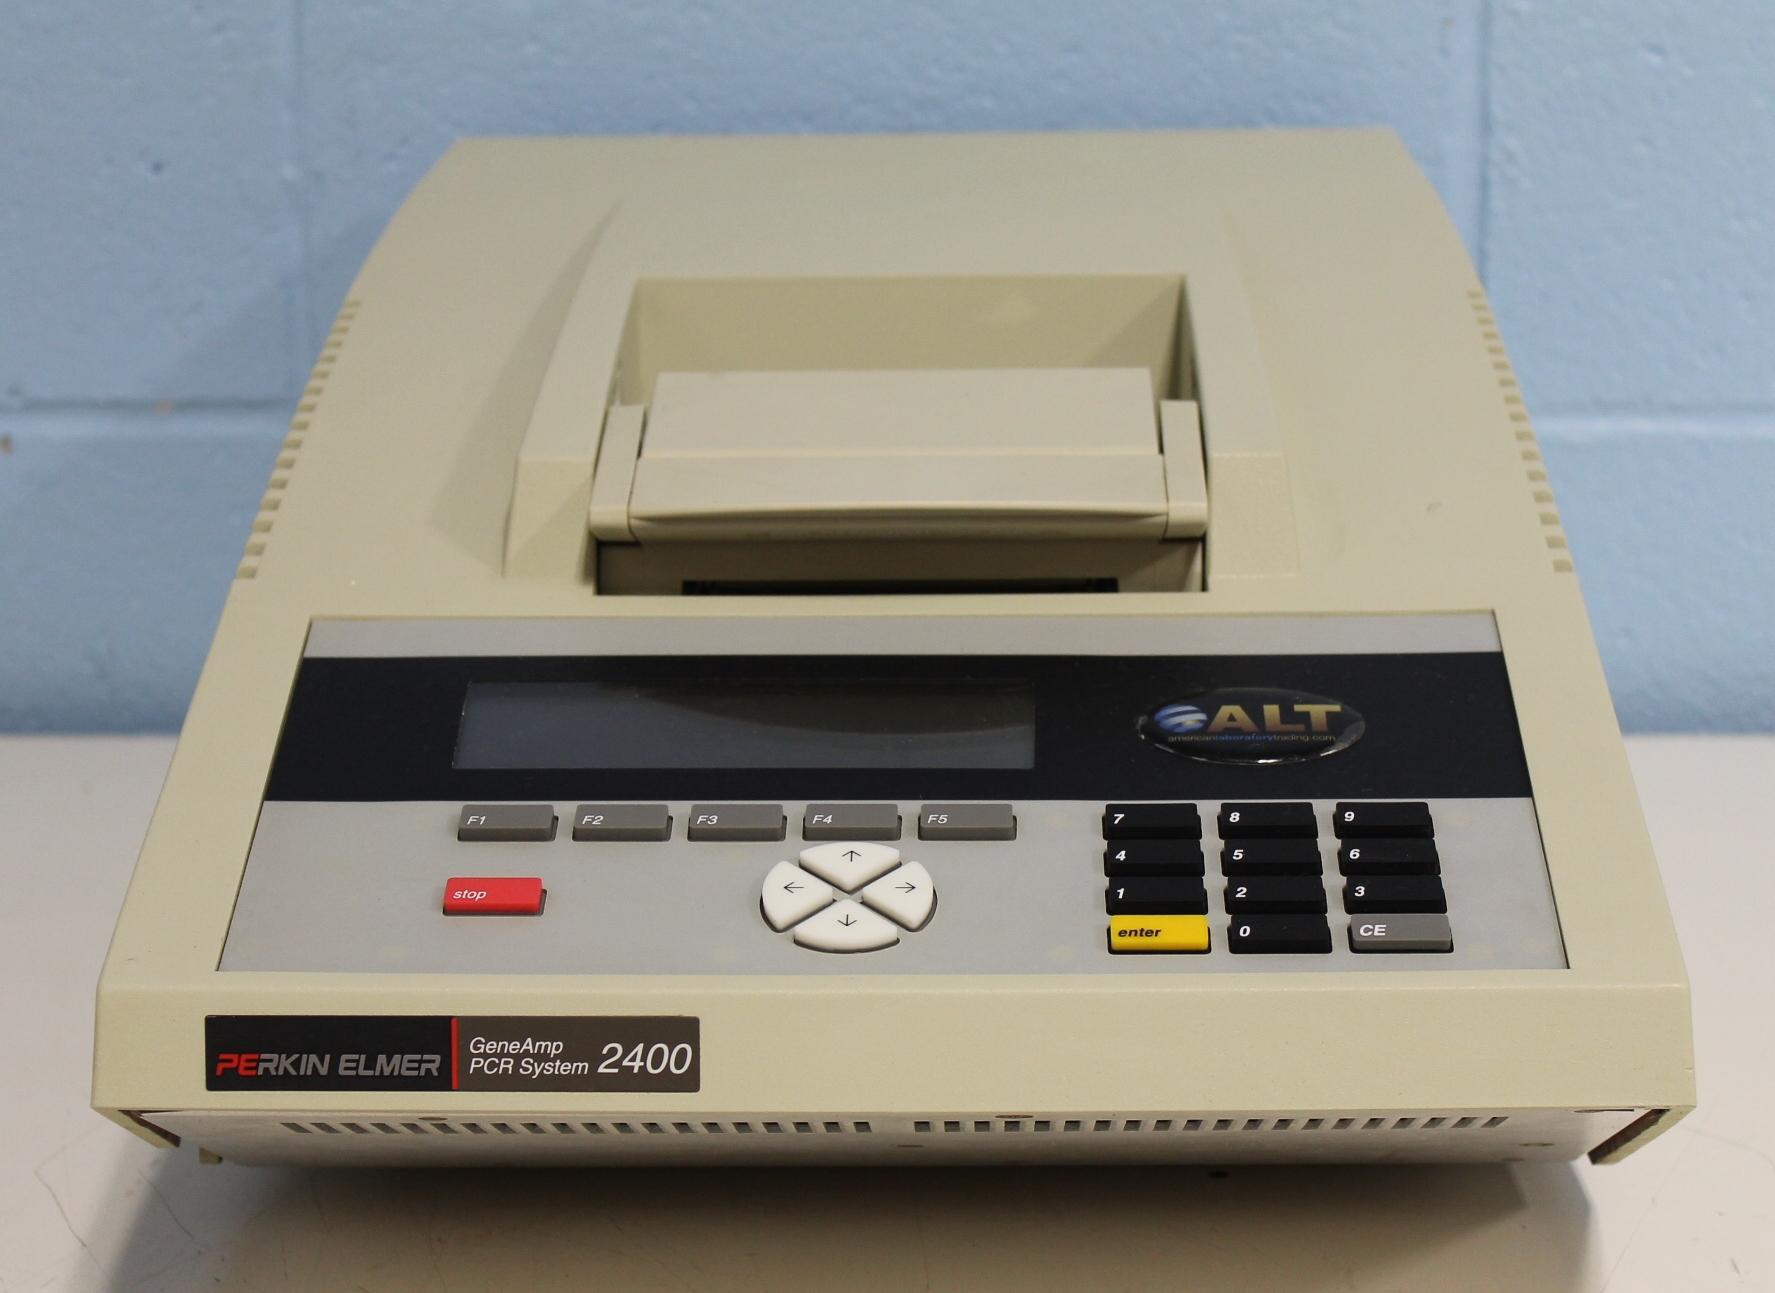 Perkin Elmer GeneAmp PCR System 2400 Image